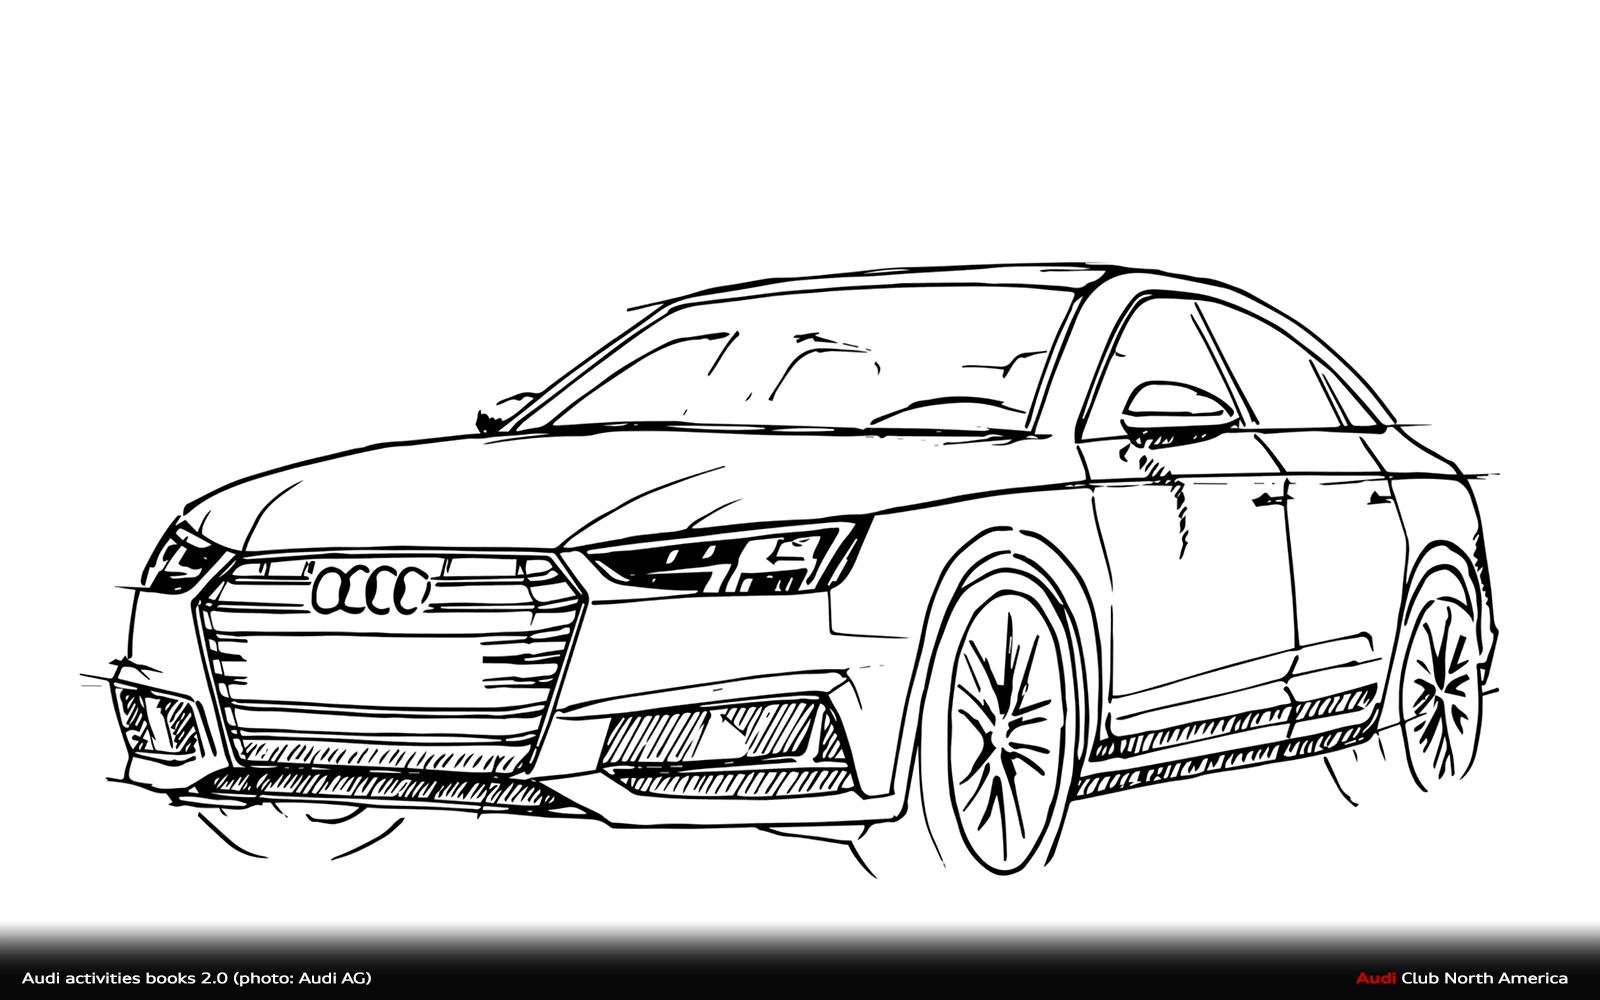 Choice Gear Audi Activity Books 2 0 Audi Club North America